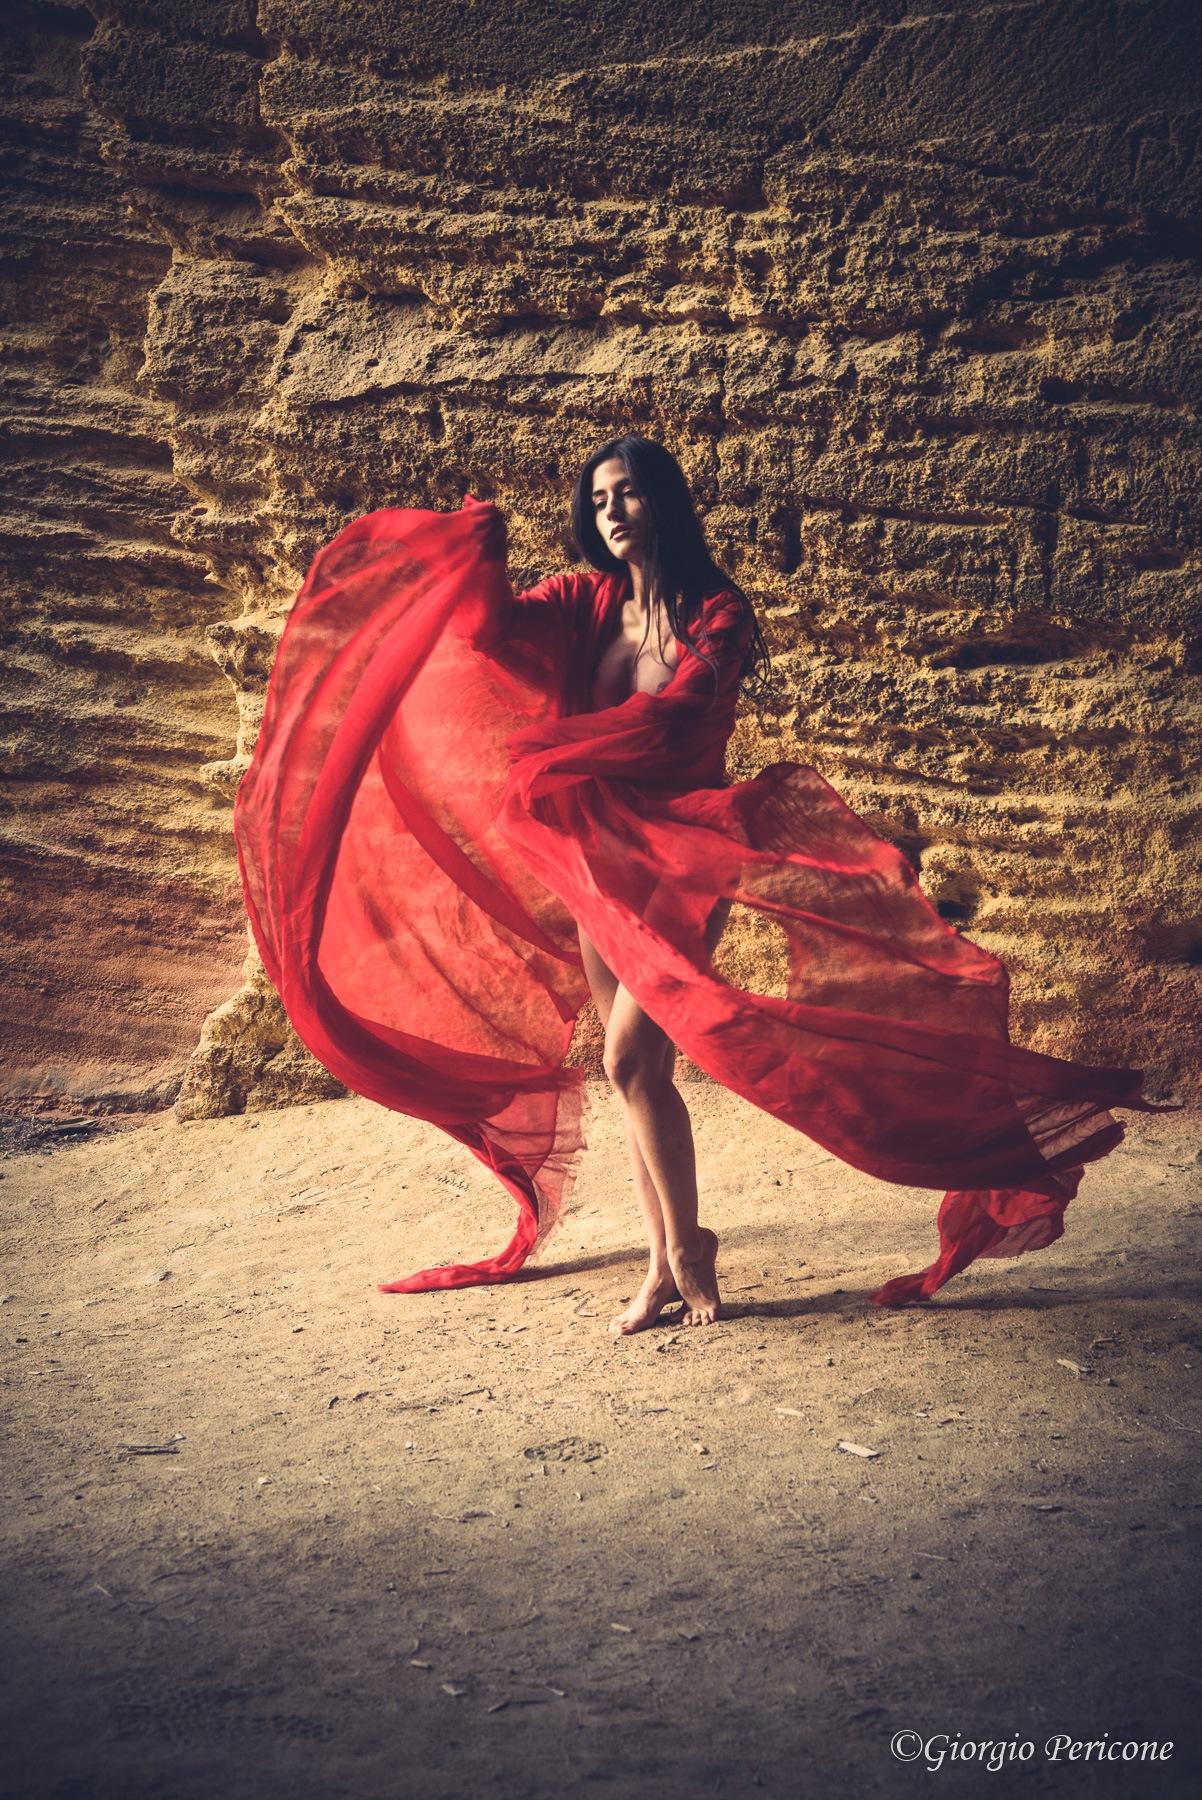 The red veil 2 by Giorgio Pericone